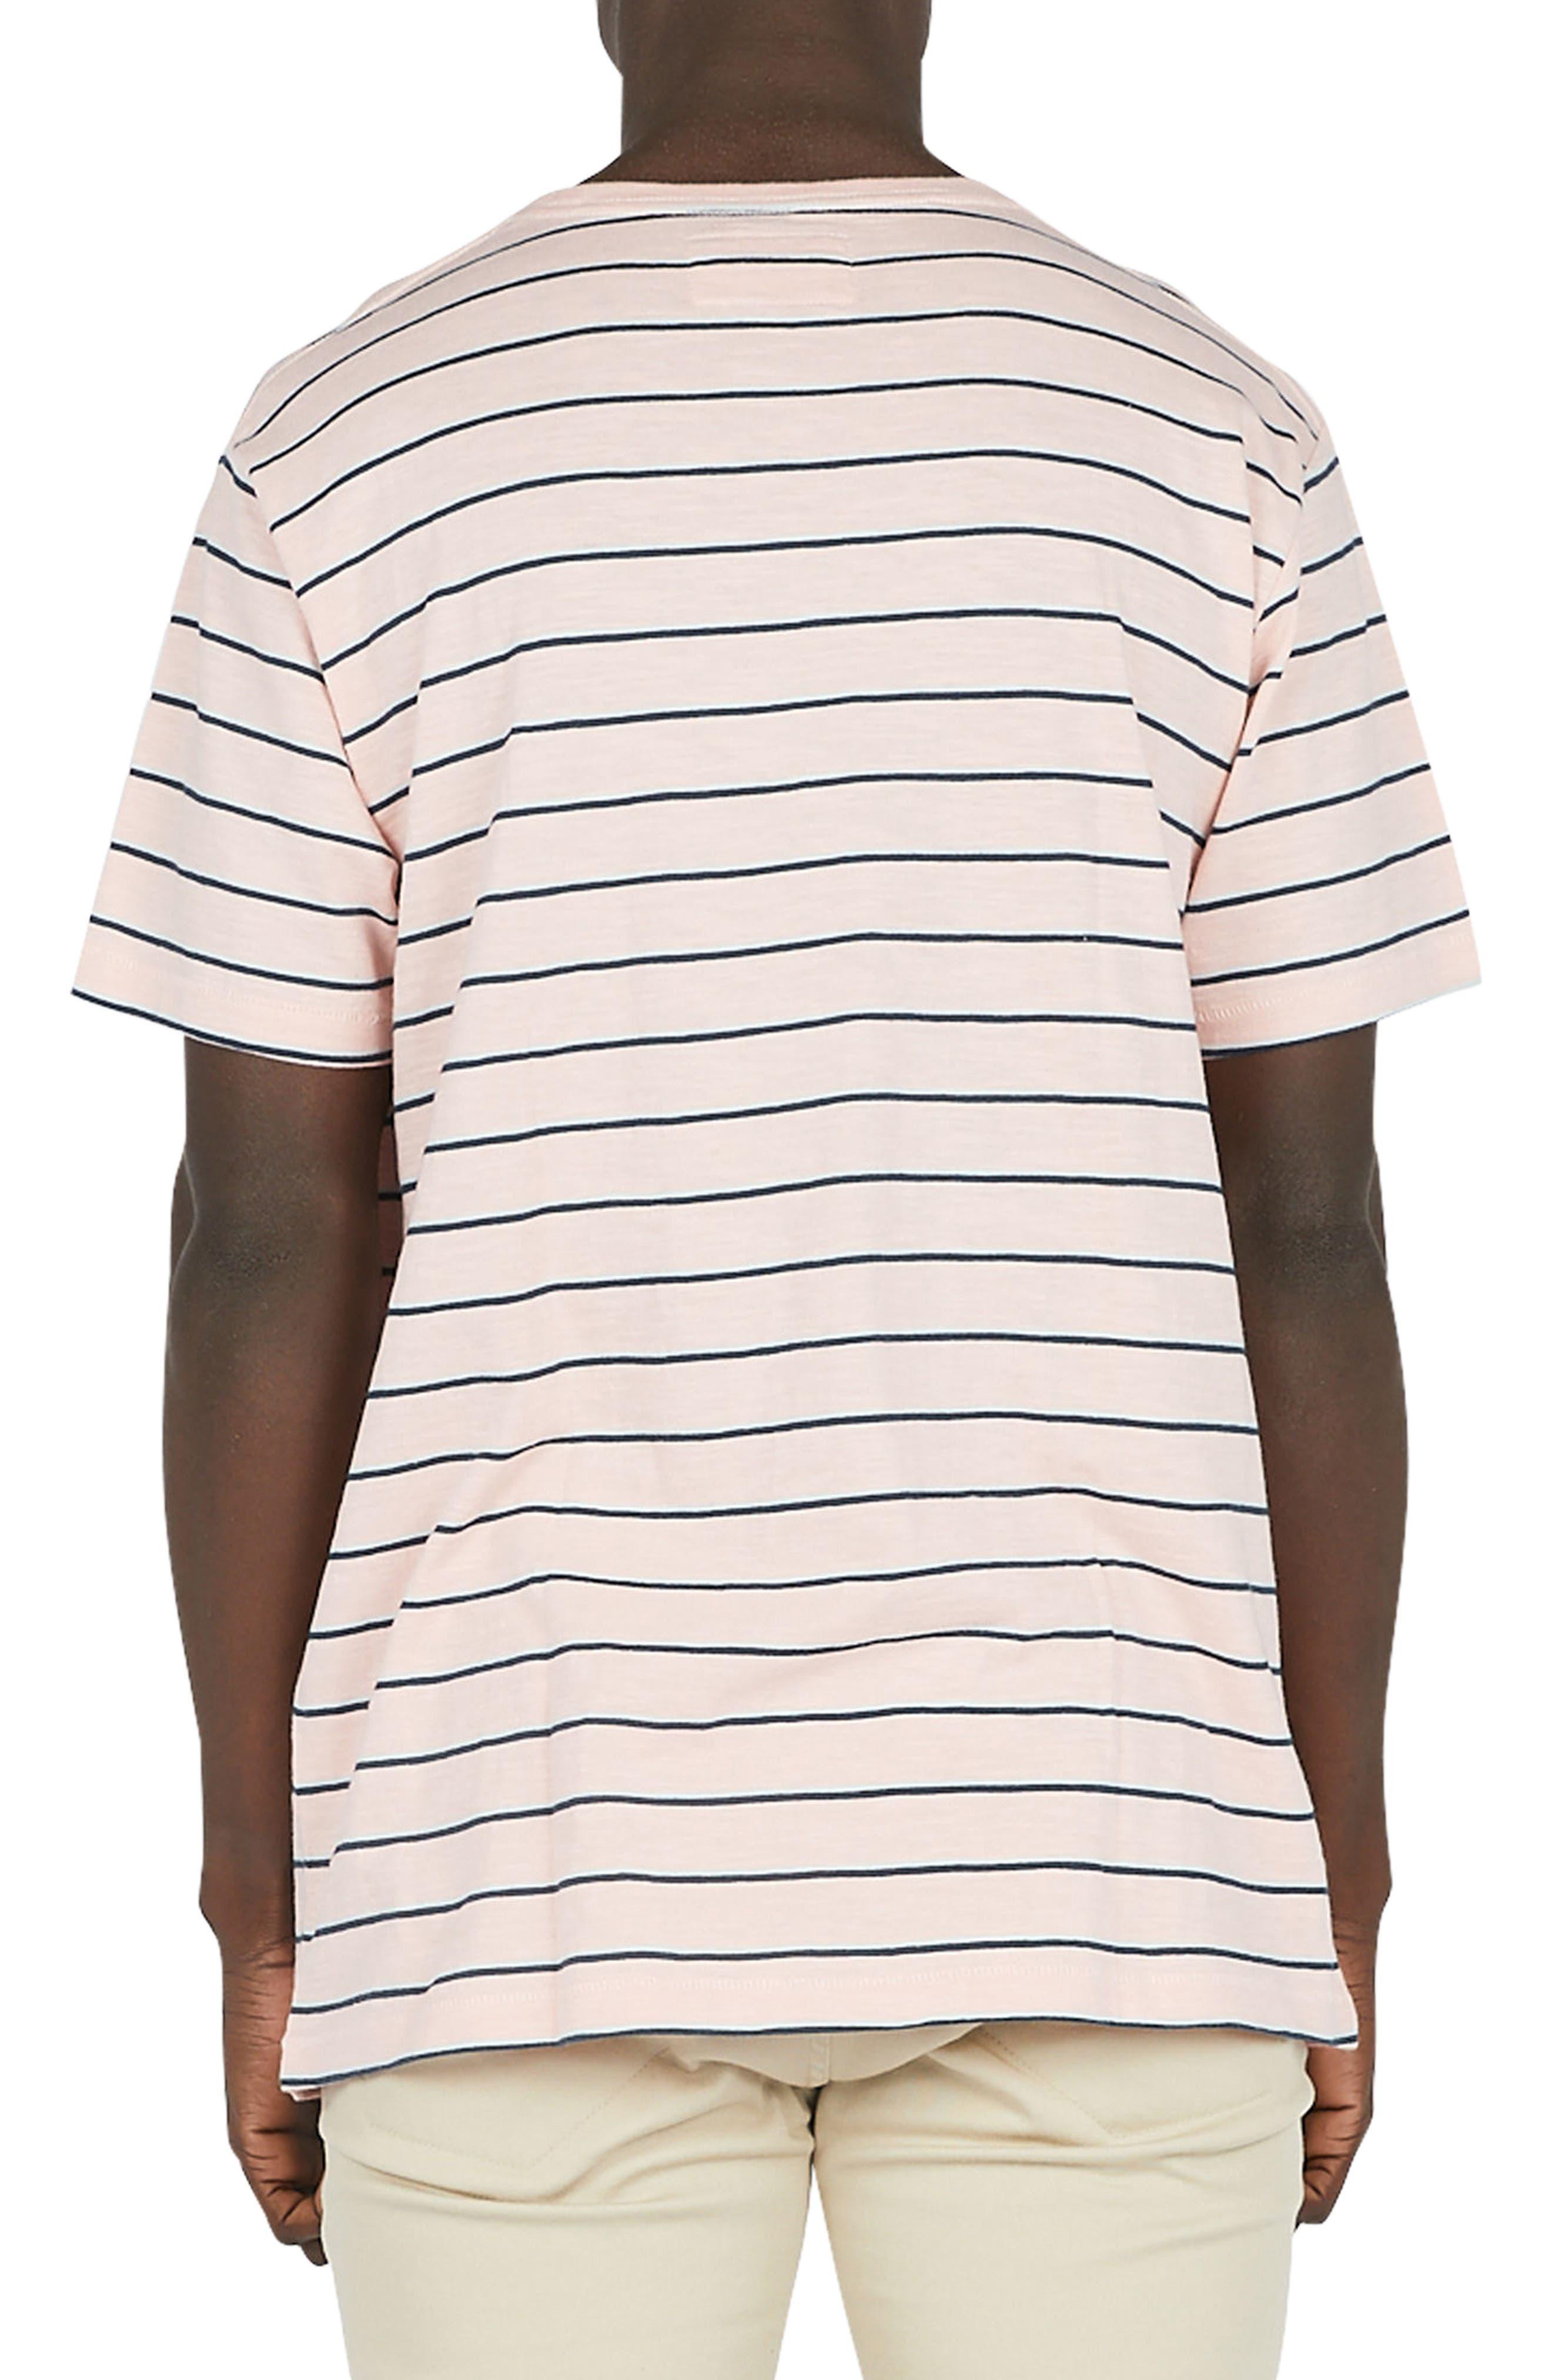 B.Schooled T-Shirt,                             Alternate thumbnail 2, color,                             Pink Stripe